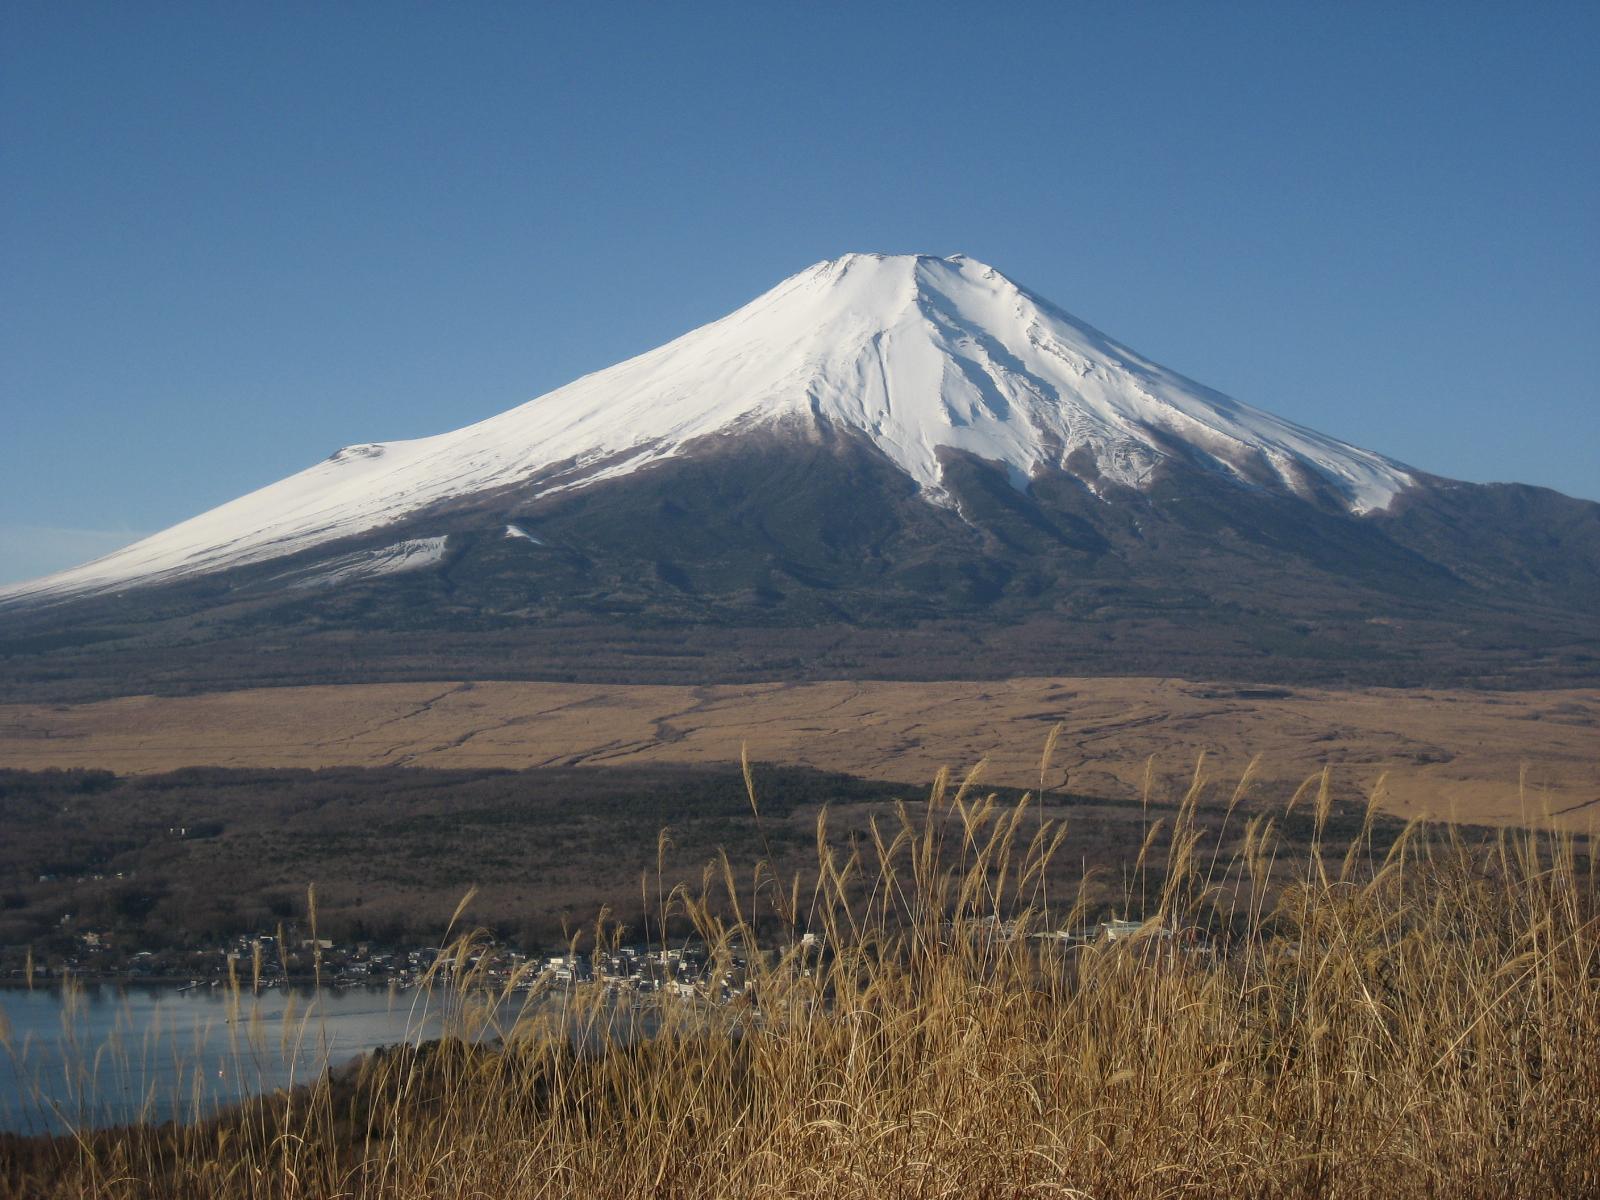 CLIMB JAPAN: Winter Mt Fuji (富士山) - some climbing strategies